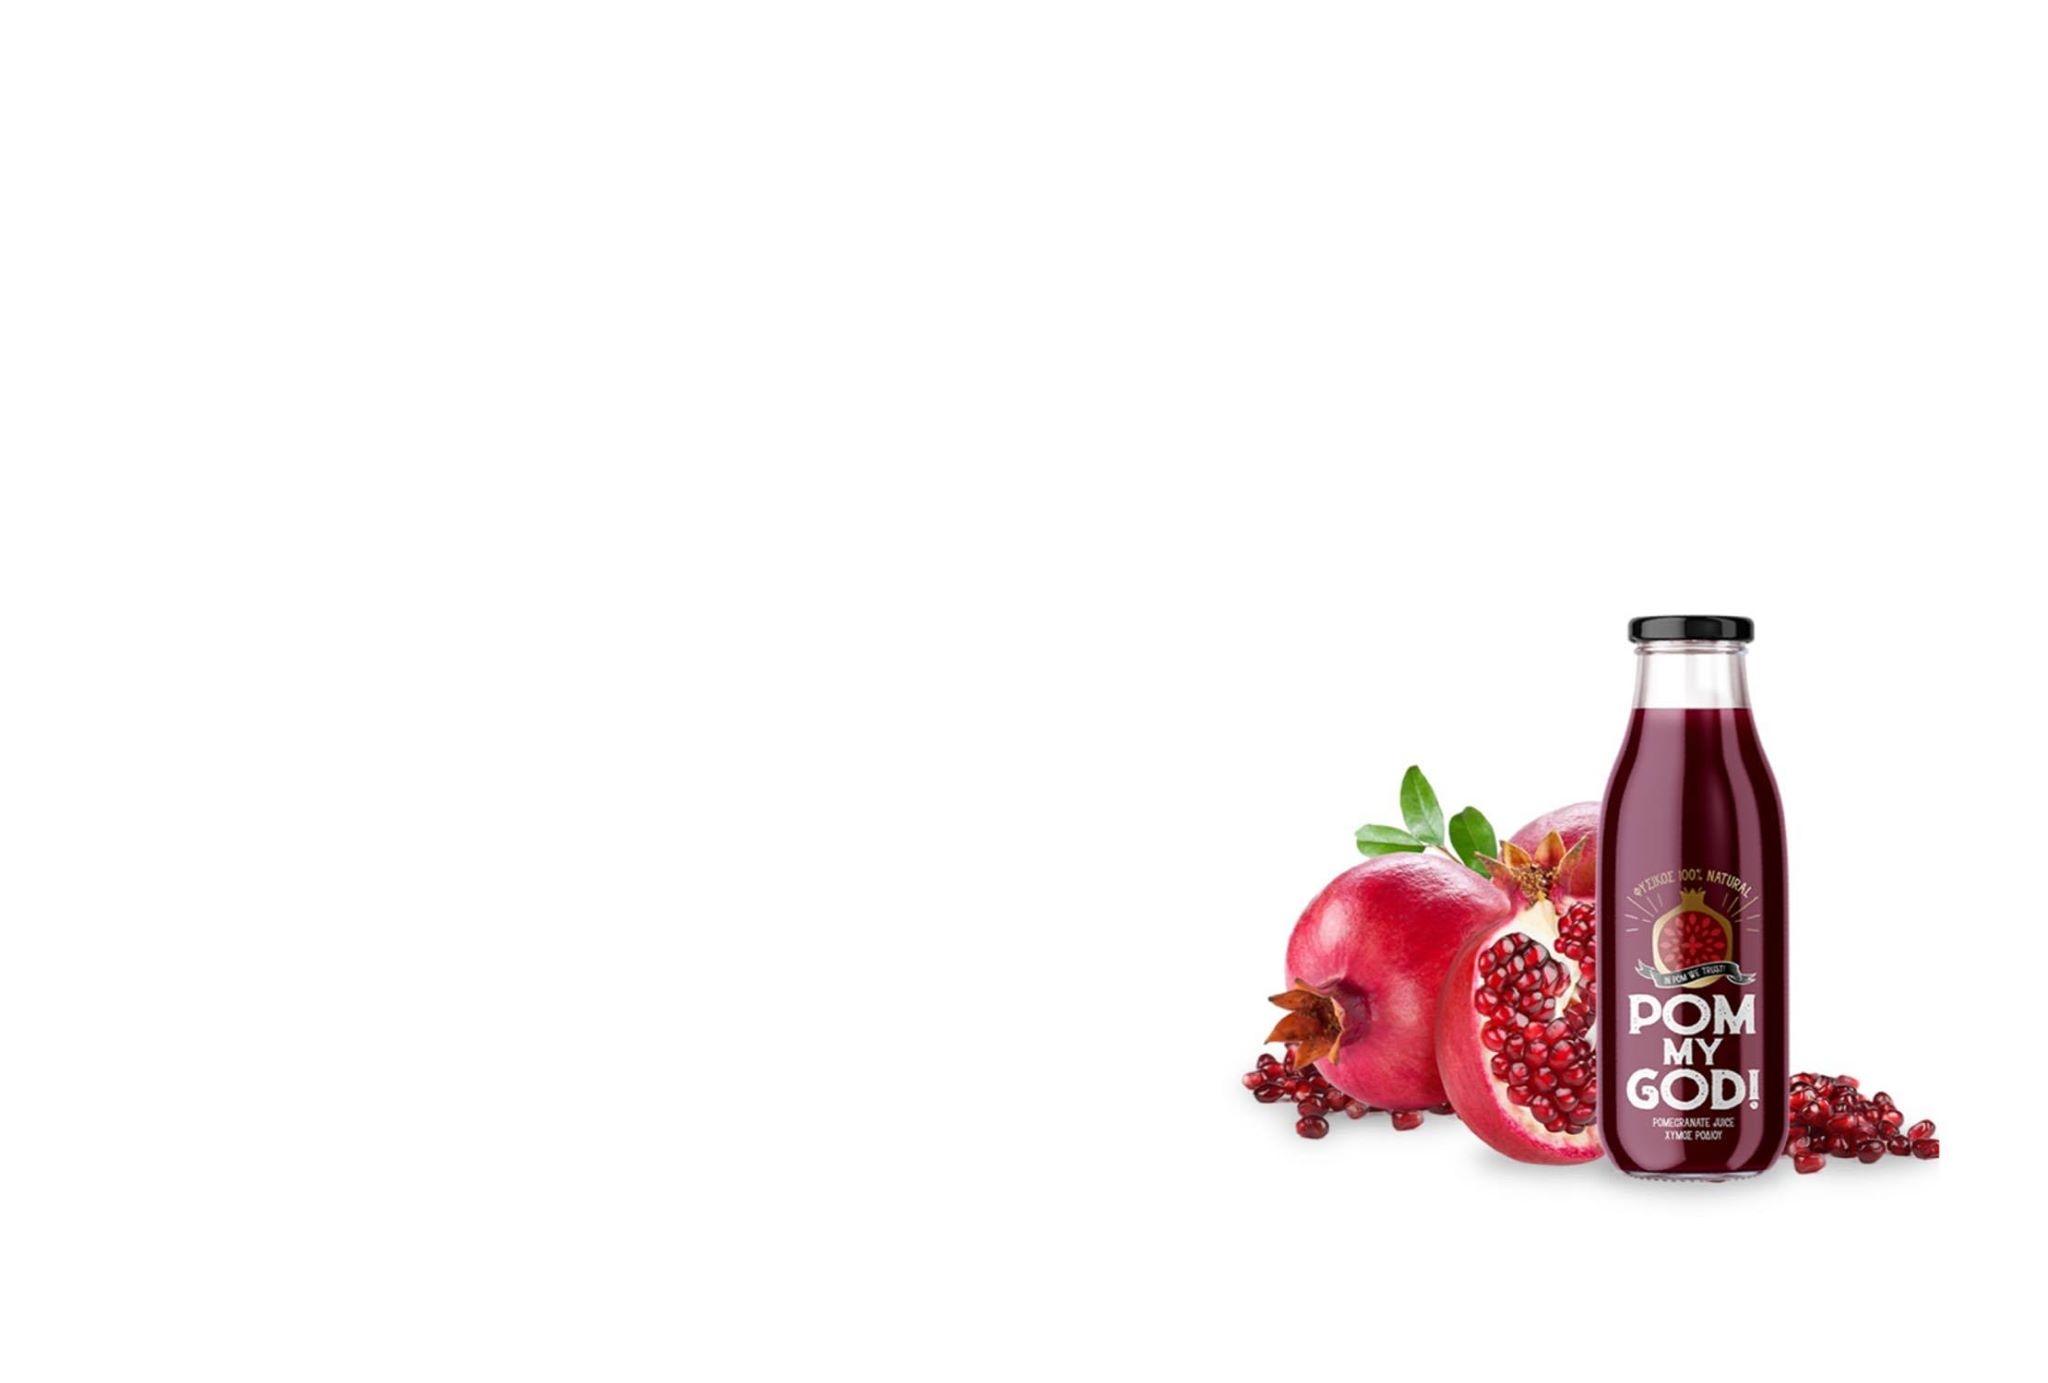 Pom My God / Fine Pomegranate Products